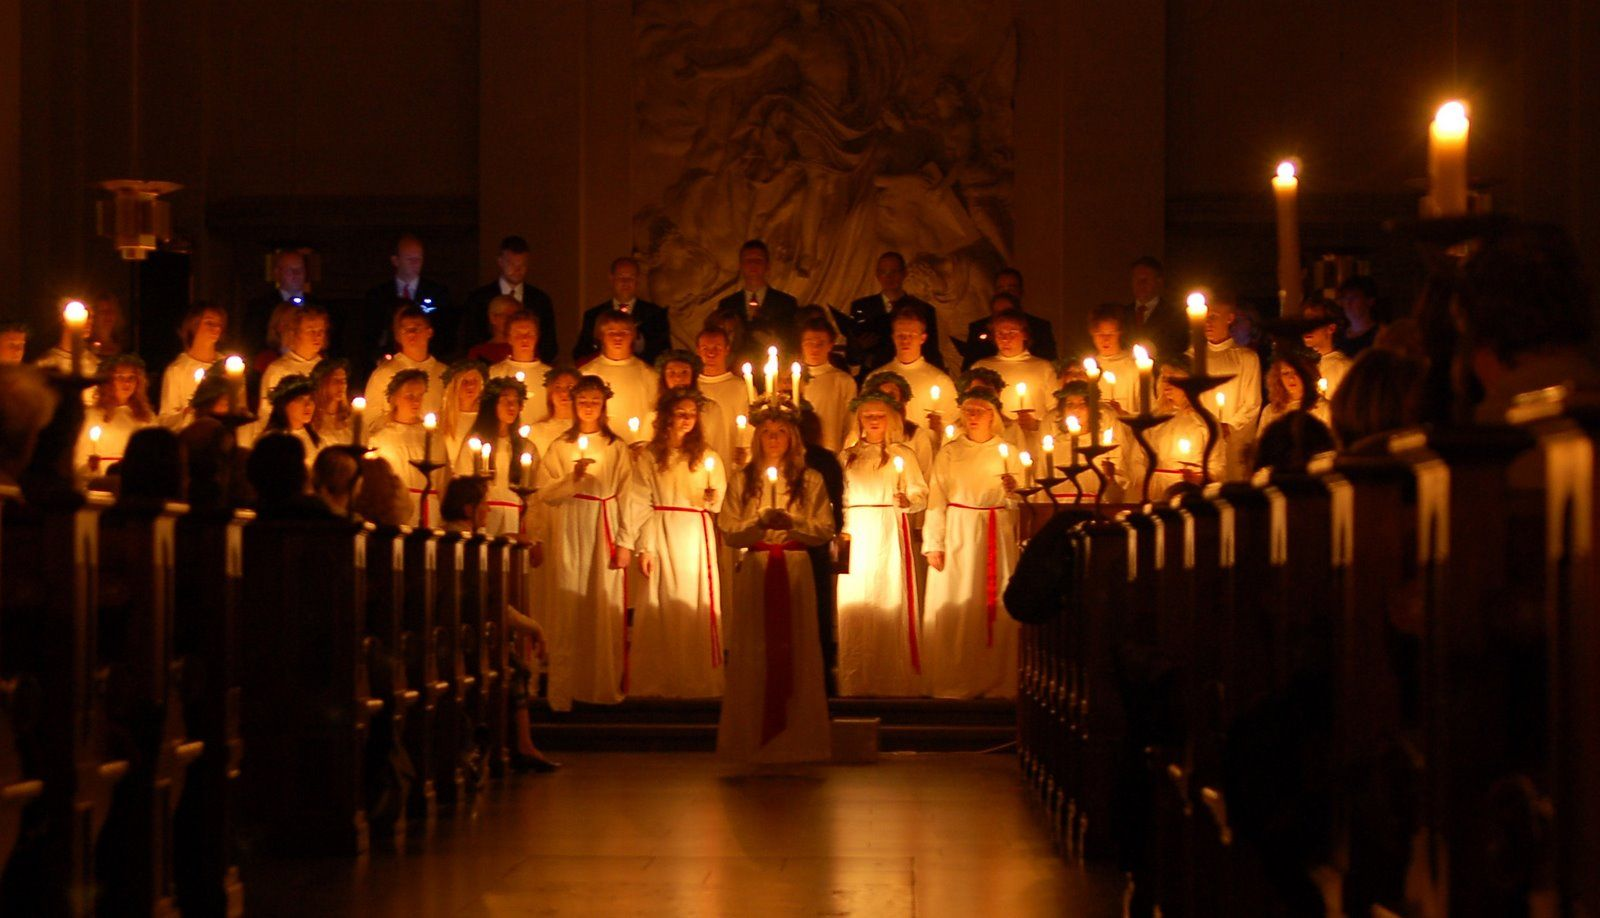 Http Scandelights Files Wordpress Com 2011 12 Luciatc3a5g Jpg Alternative Christmas Santa Lucia Day Christmas Celebrations